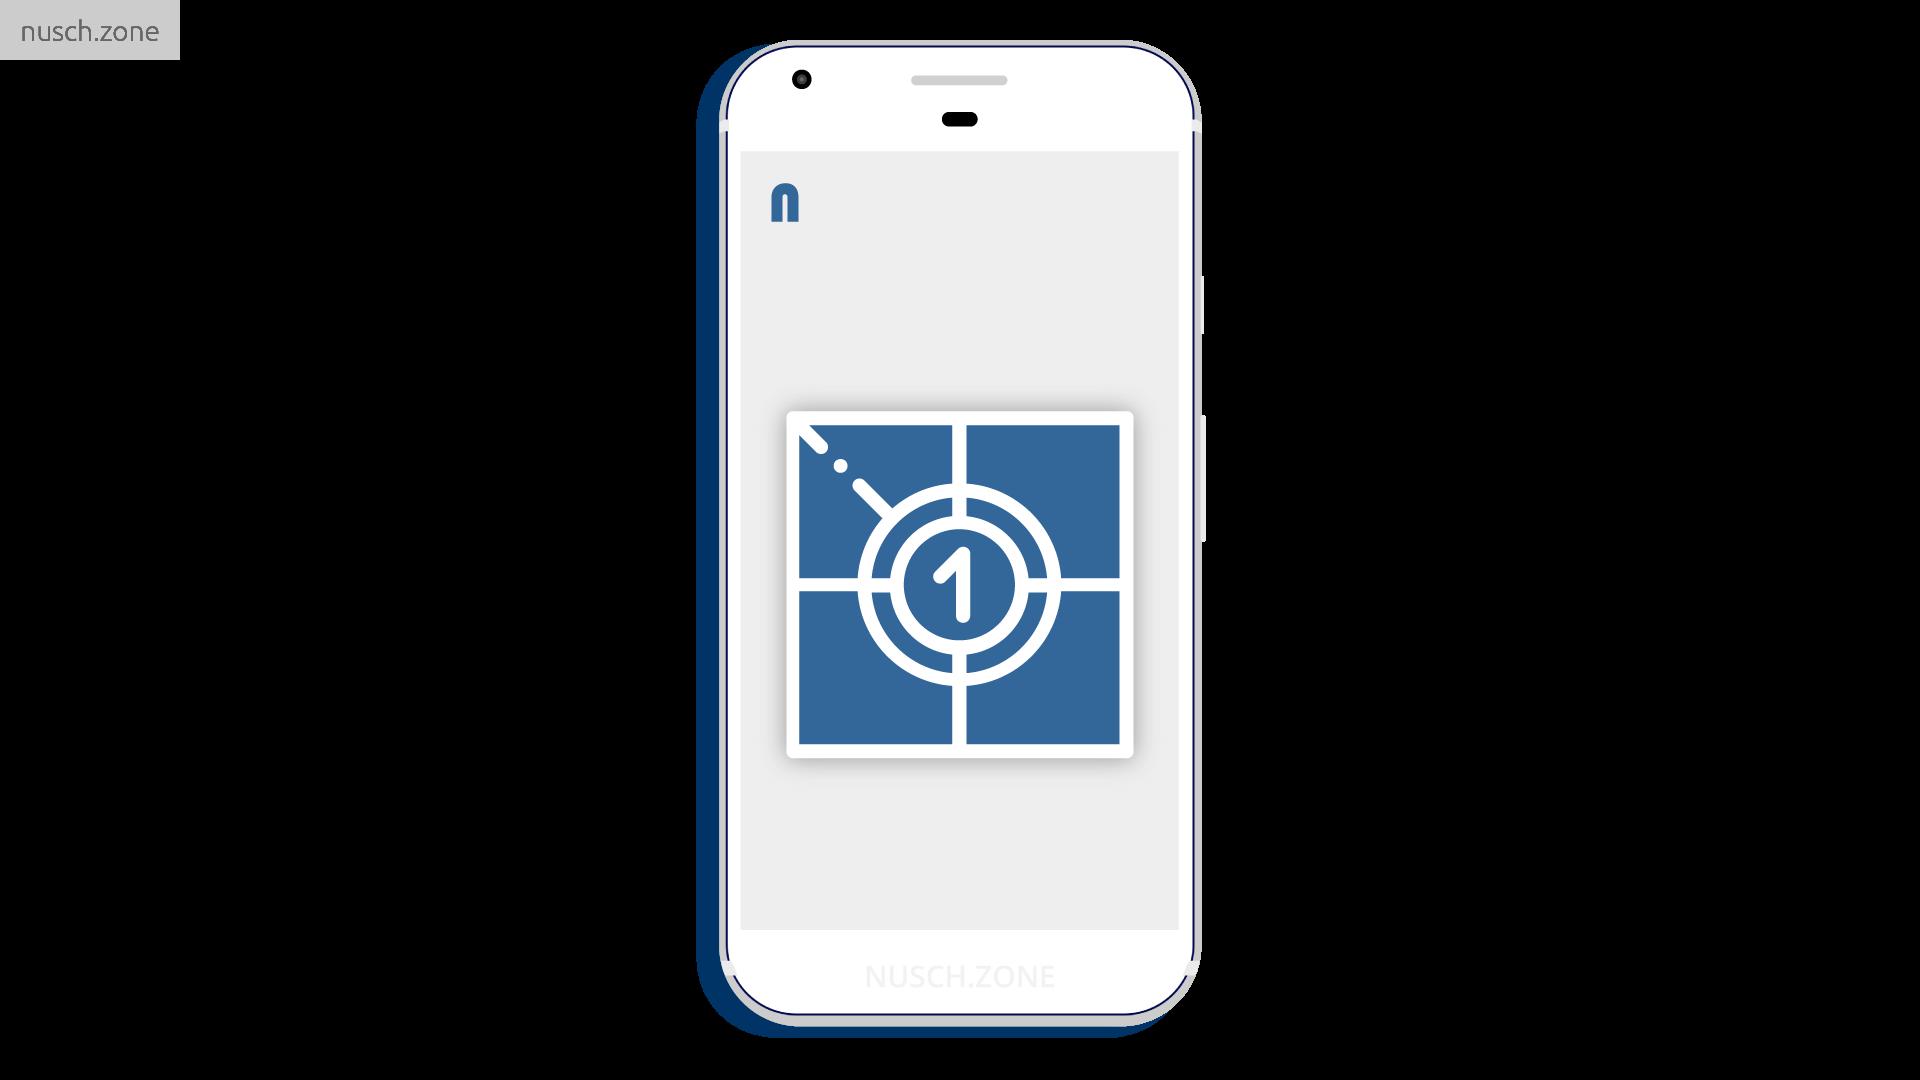 NUSCH - komfortable Handy-App